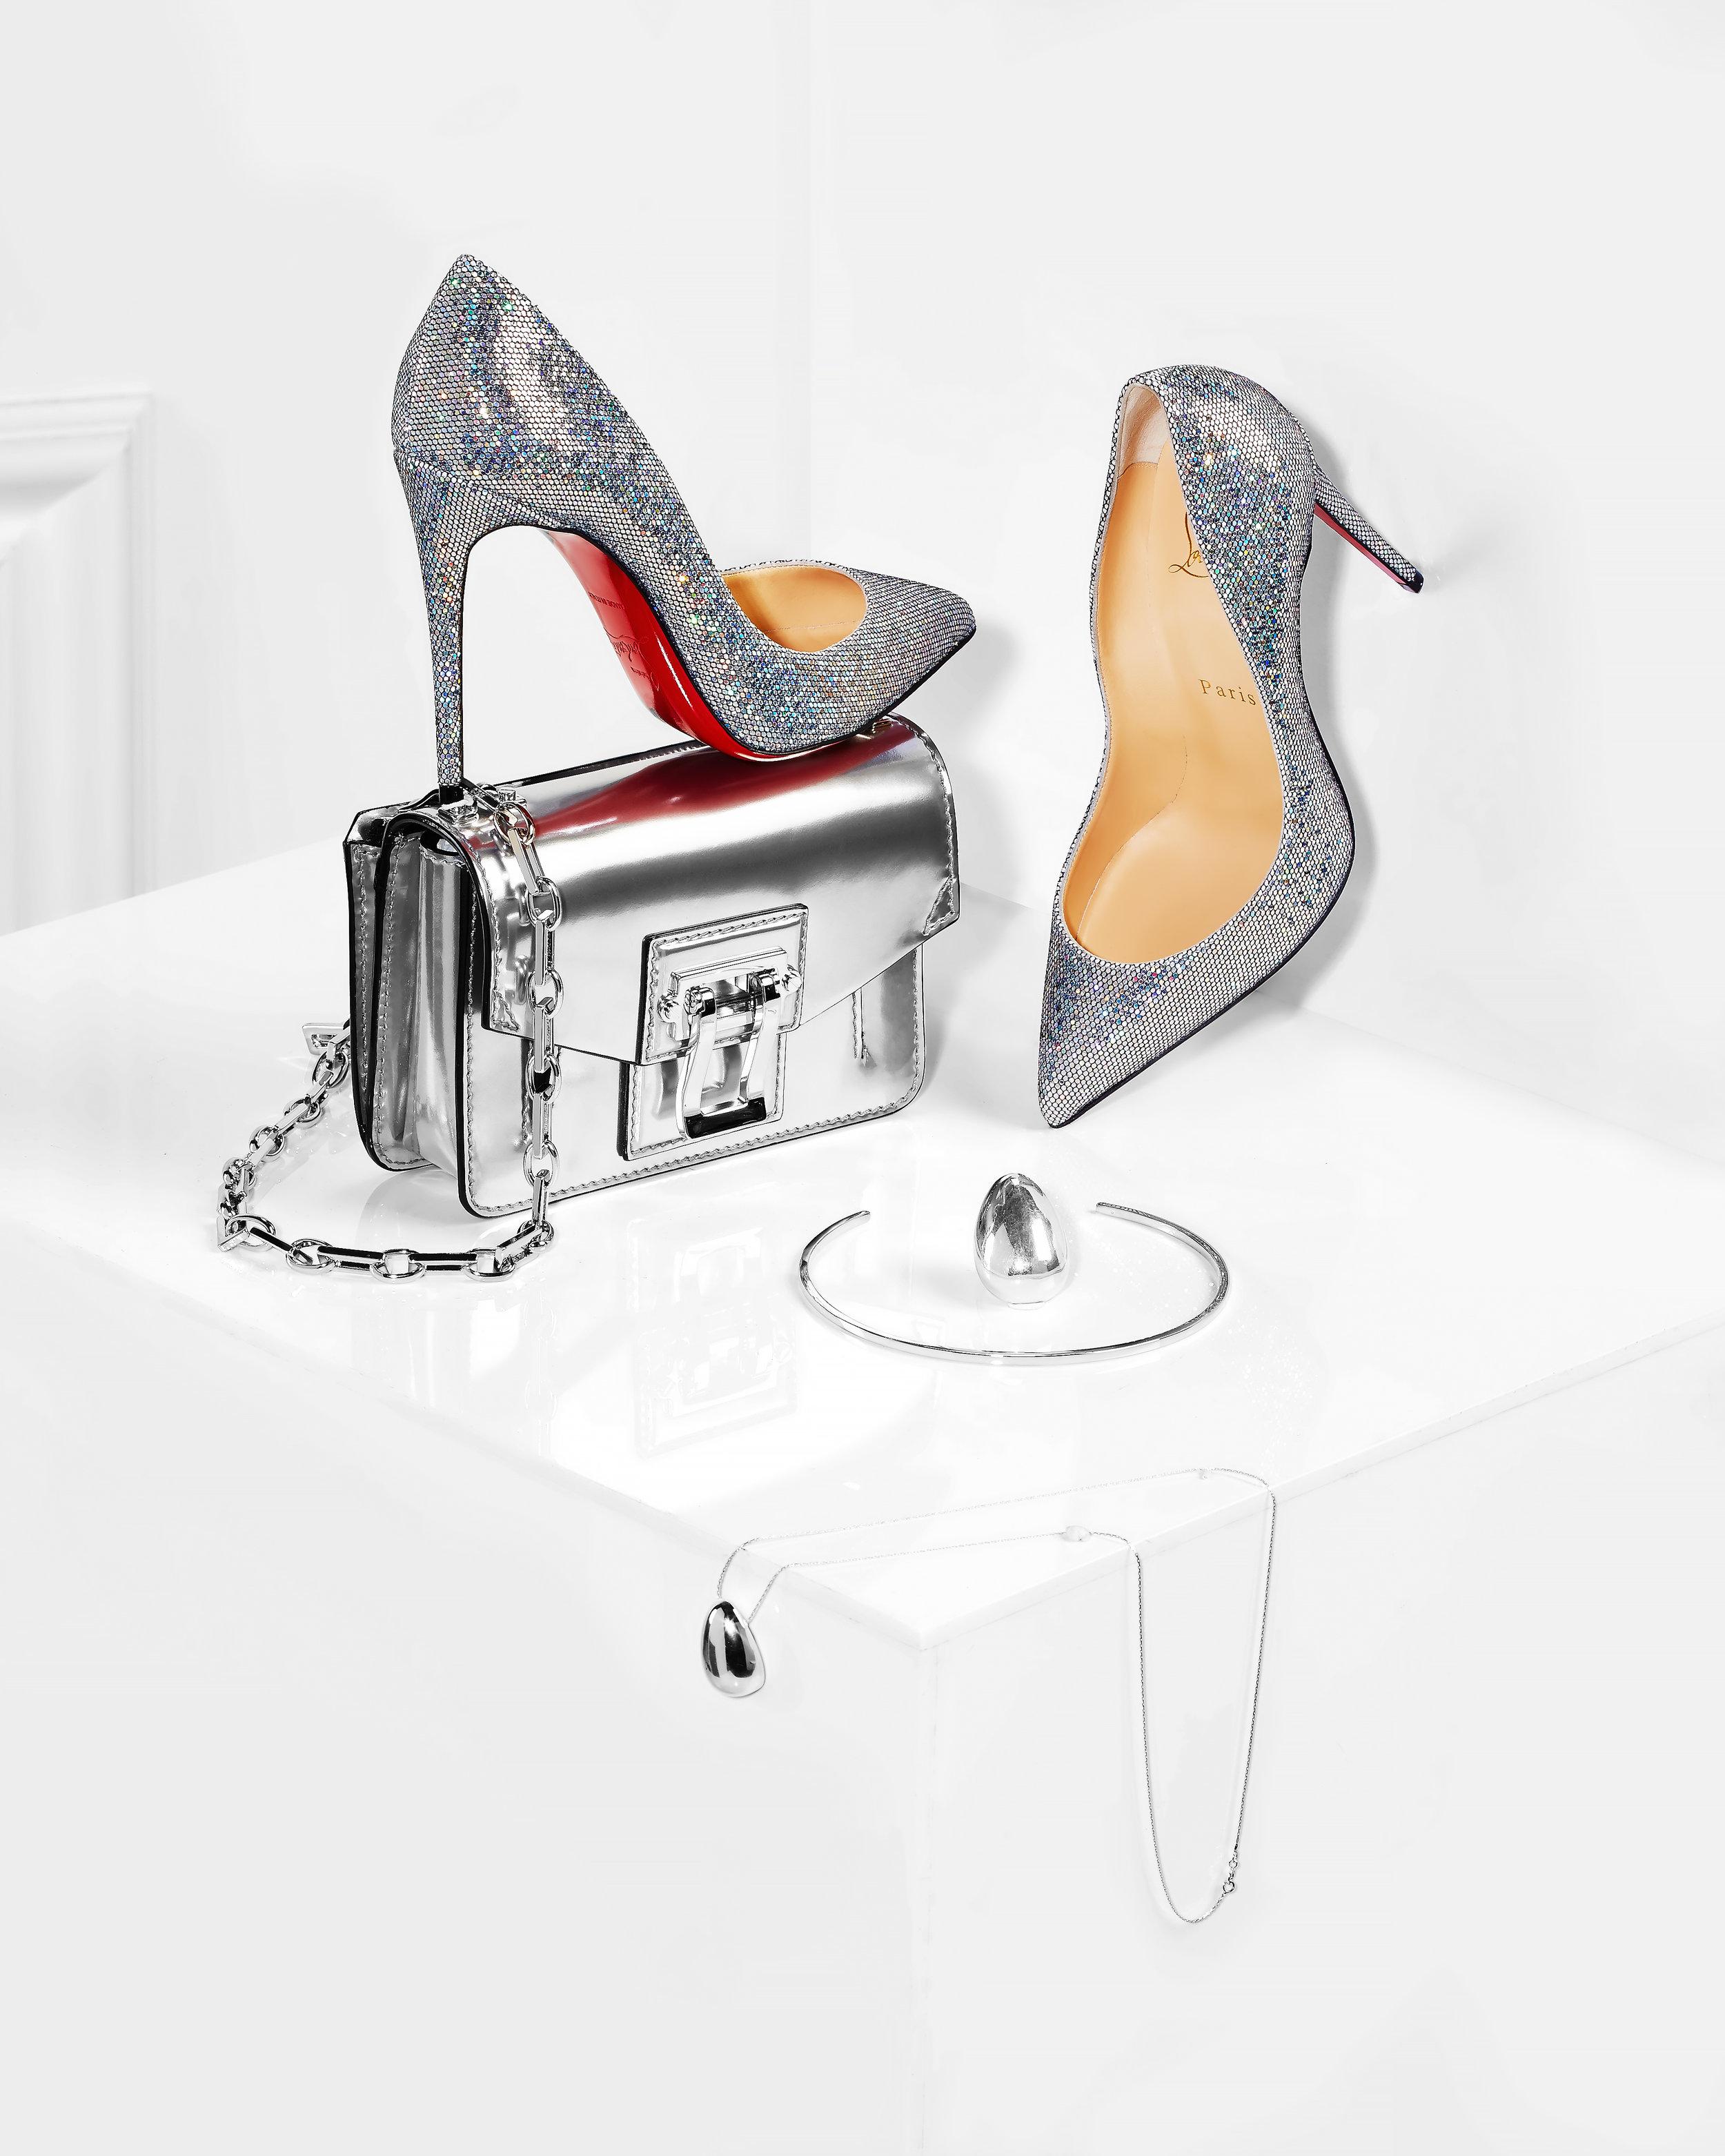 Silver_Shoe_CU.jpg